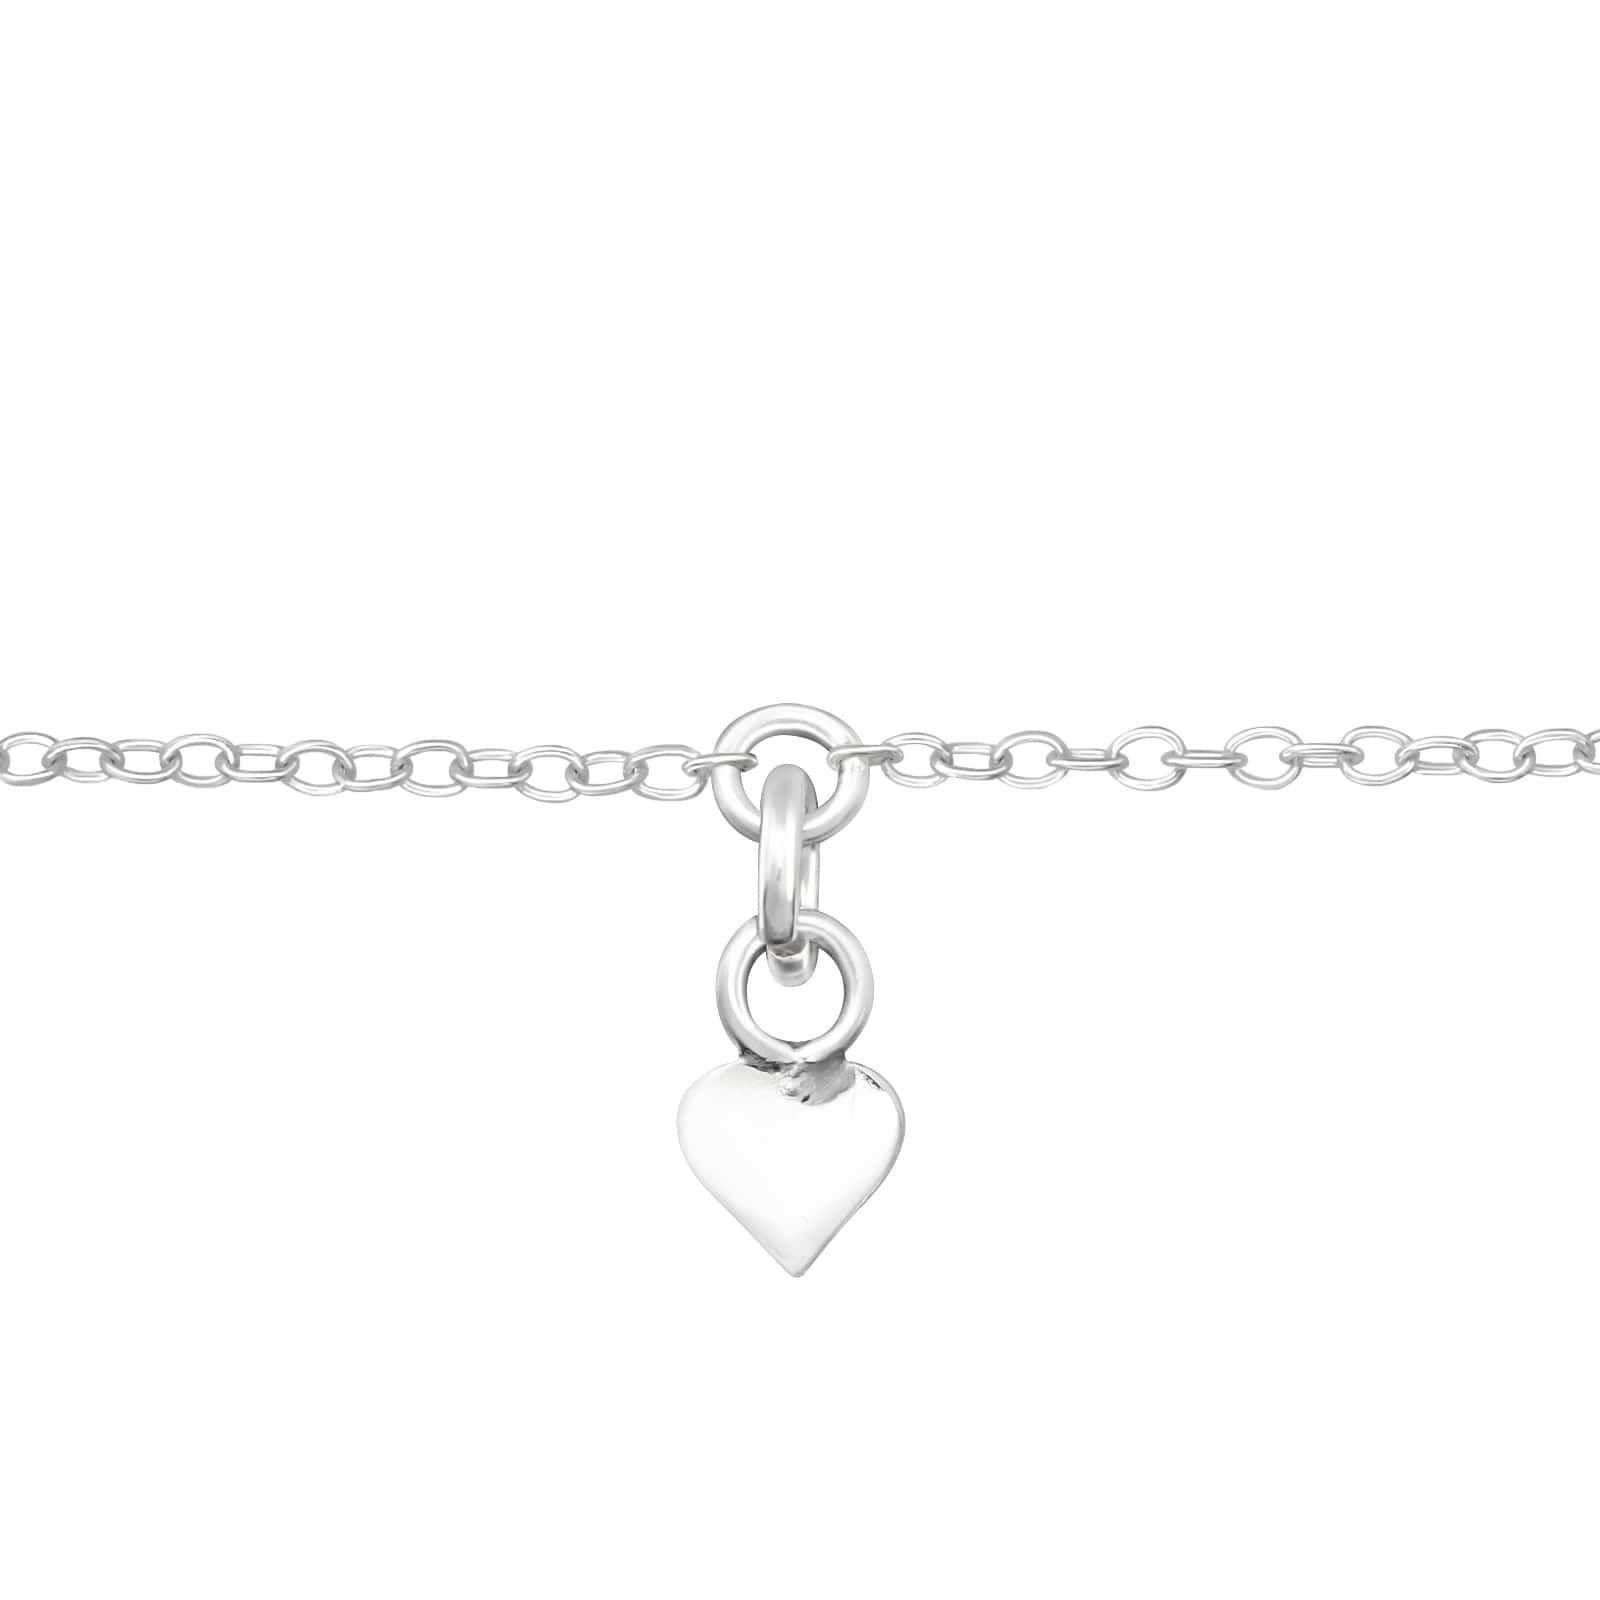 Bratara Inima Mica din Argint 925